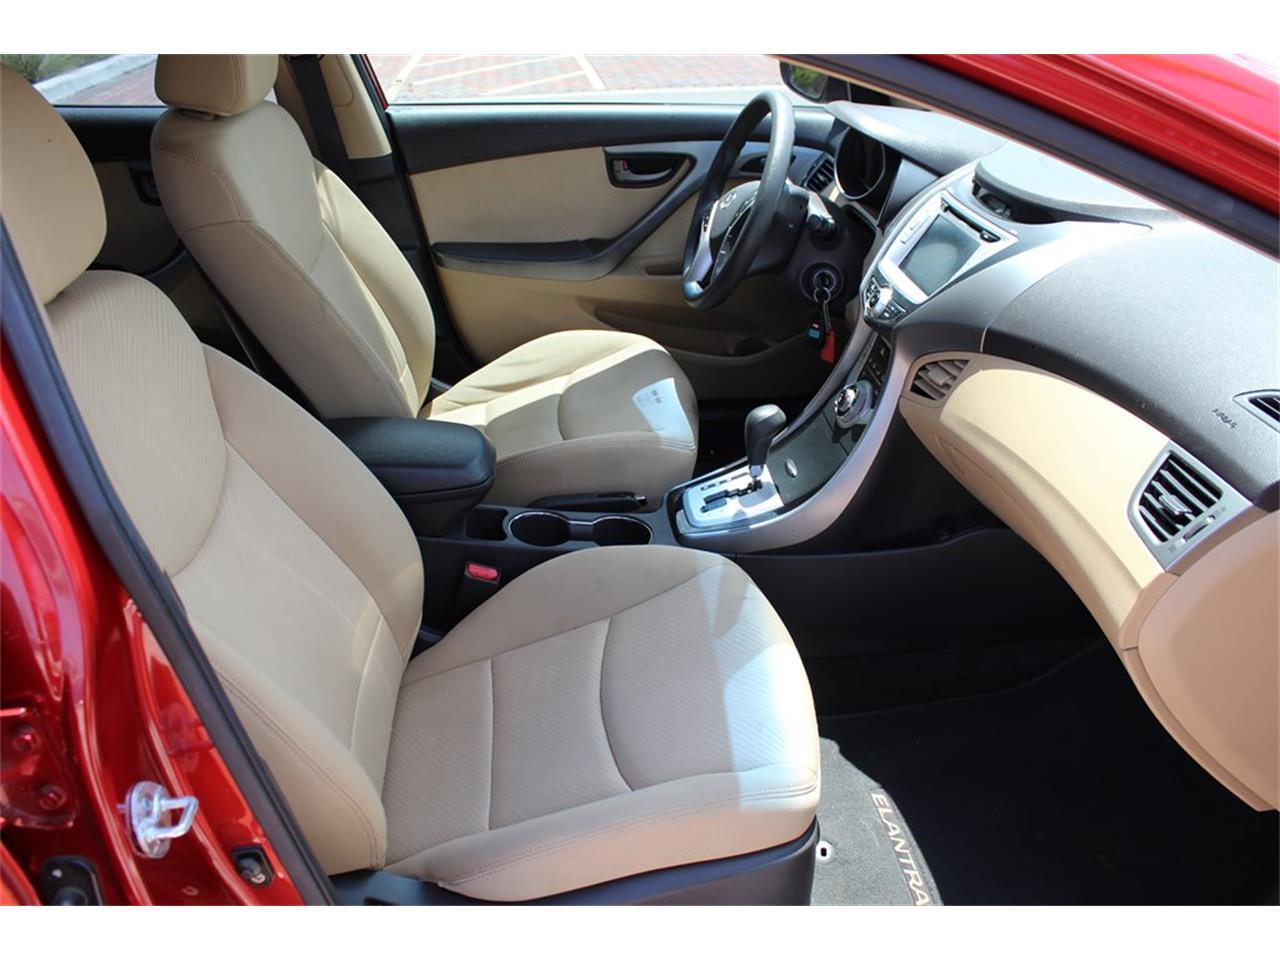 2011 Hyundai Elantra (CC-1377258) for sale in Palmetto, Florida